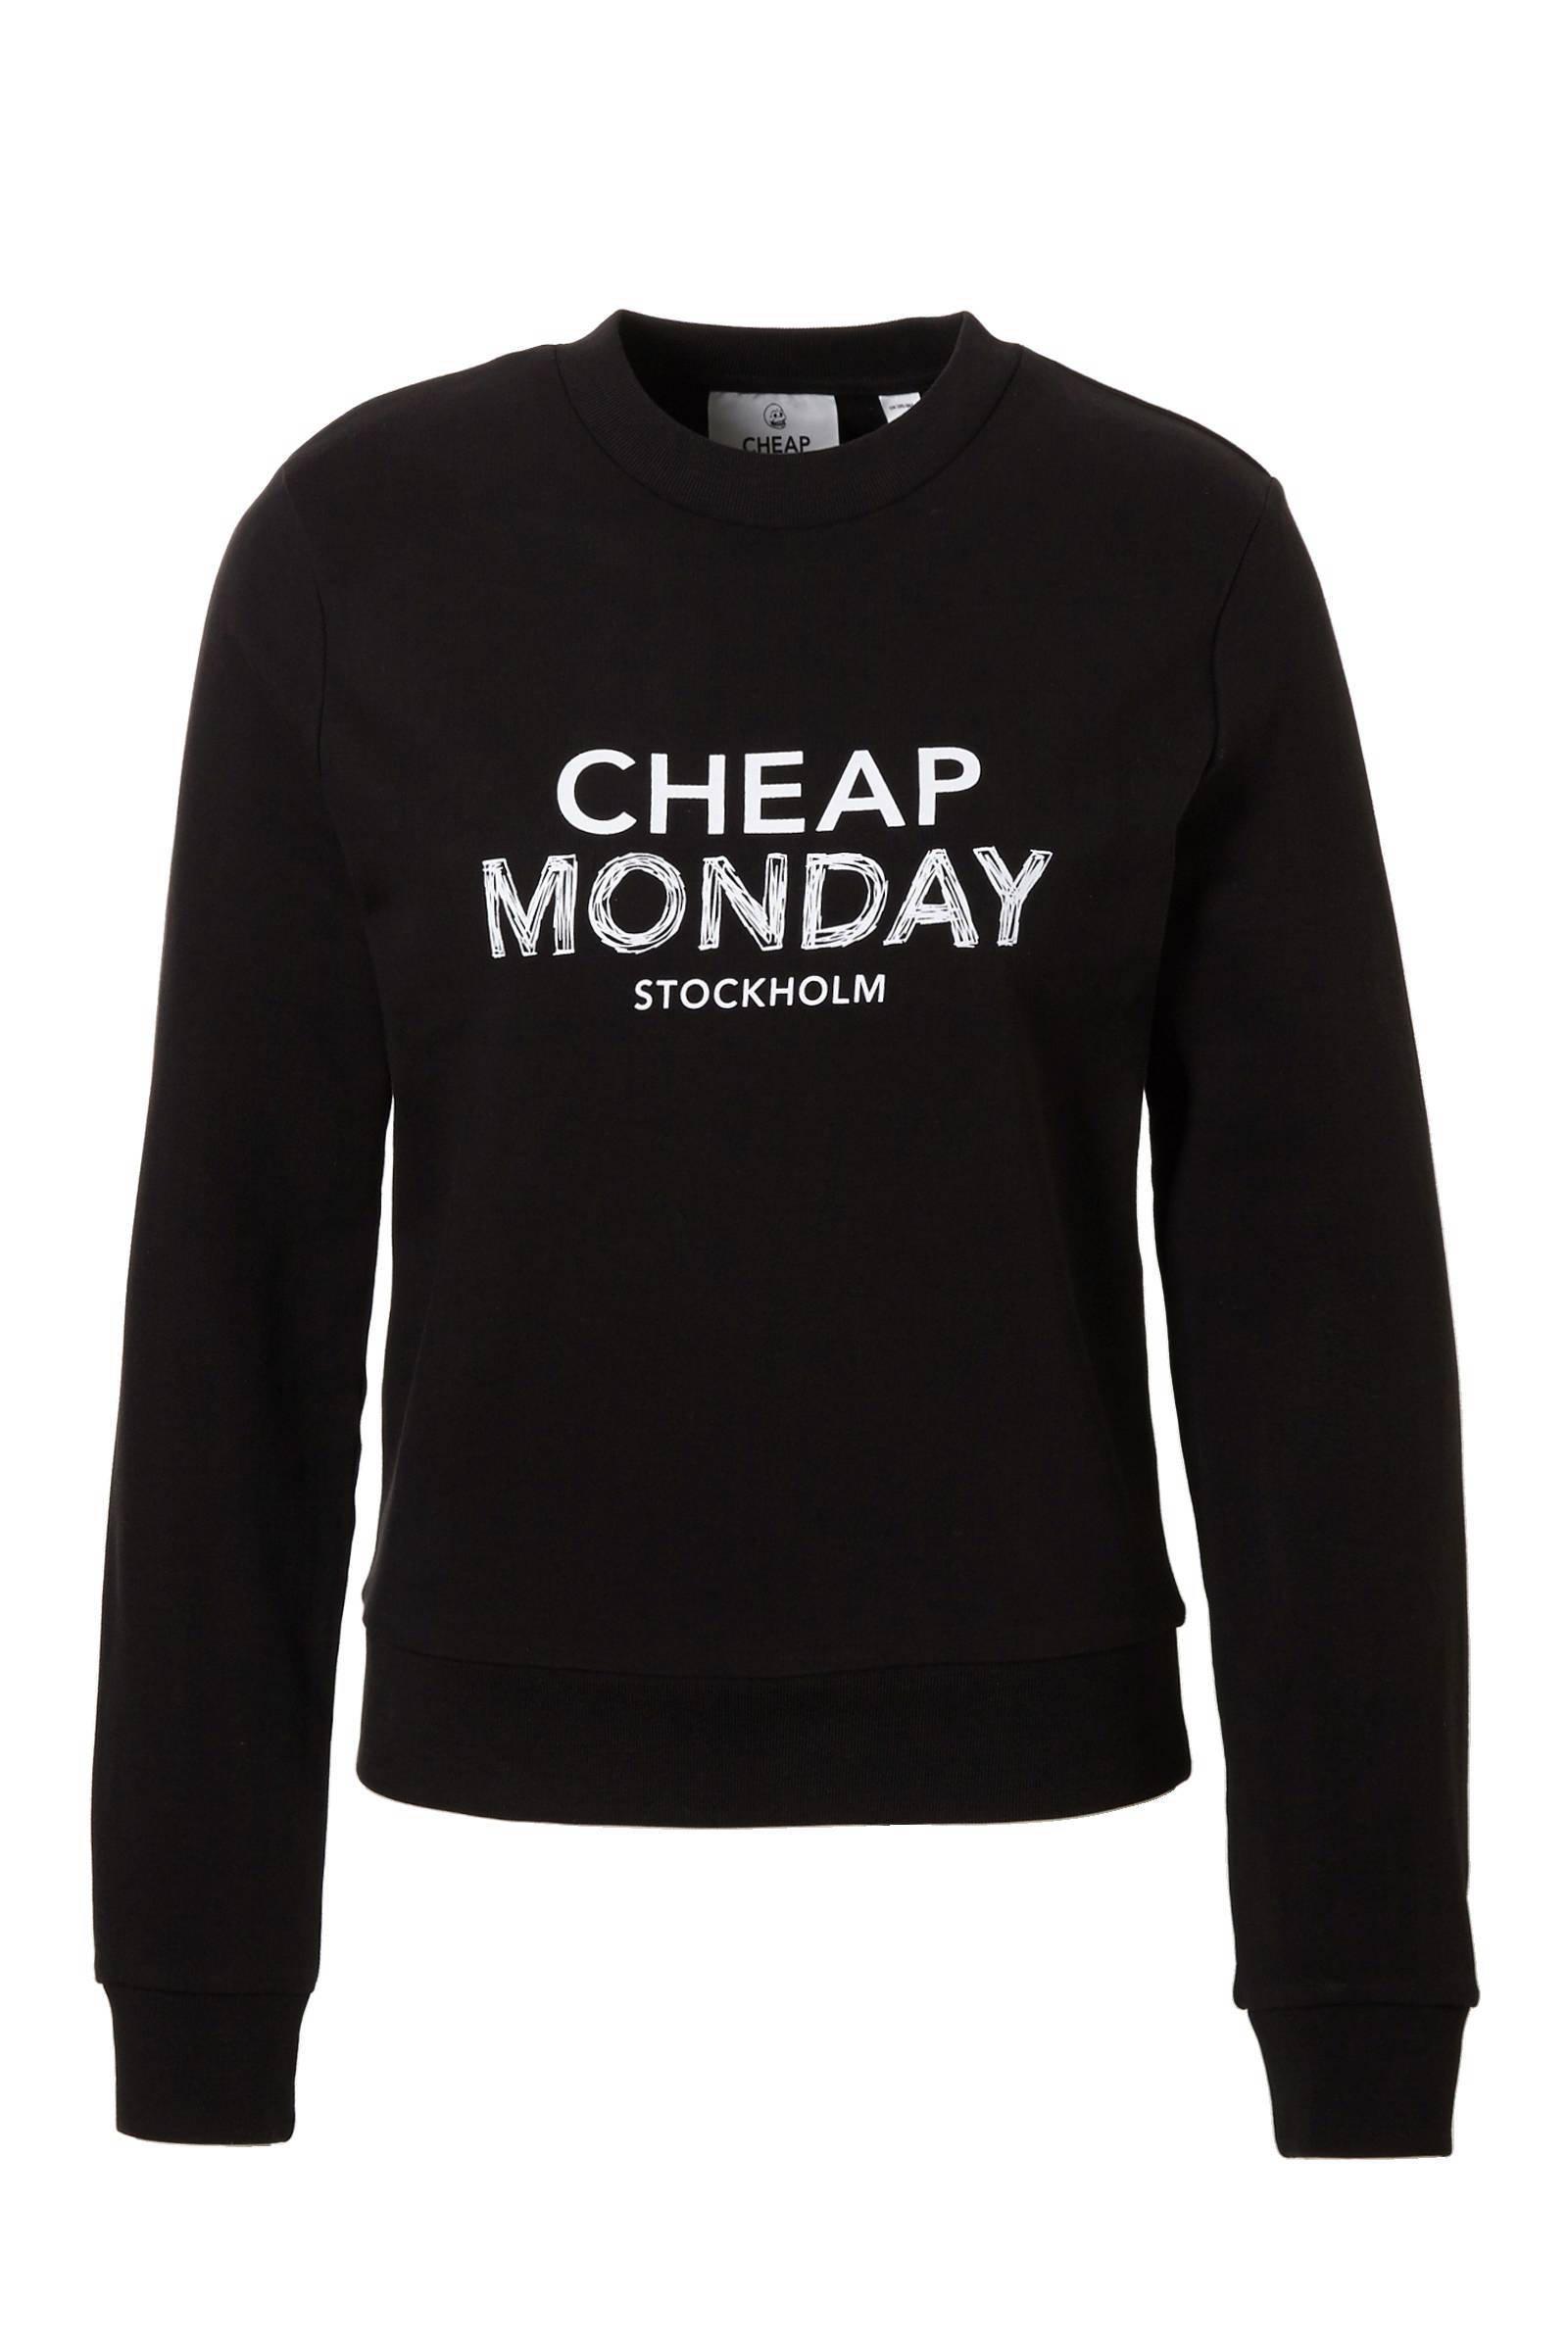 Cheap Monday Win Sweat trui   wehkamp